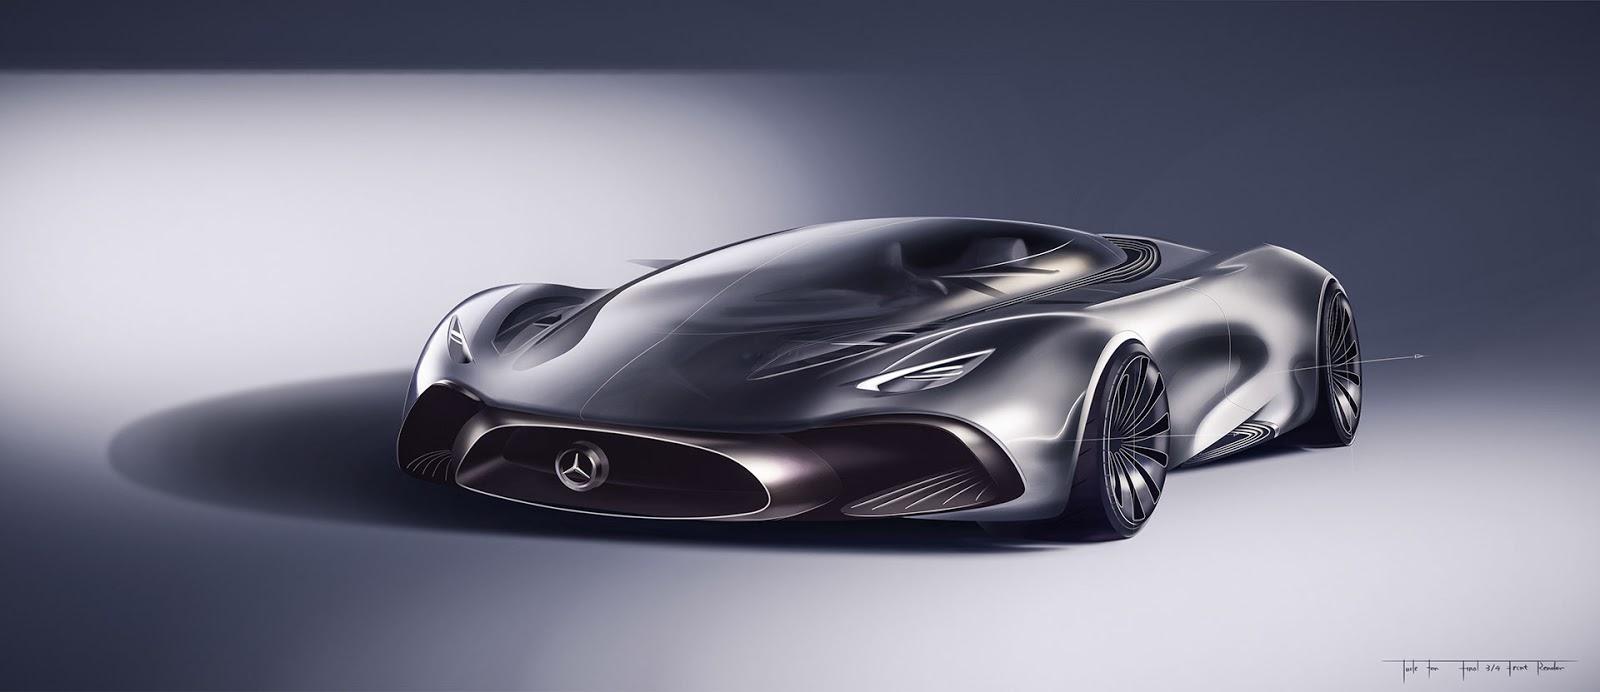 Designer's Take On A Mercedes Hybrid Supercar Looks ...